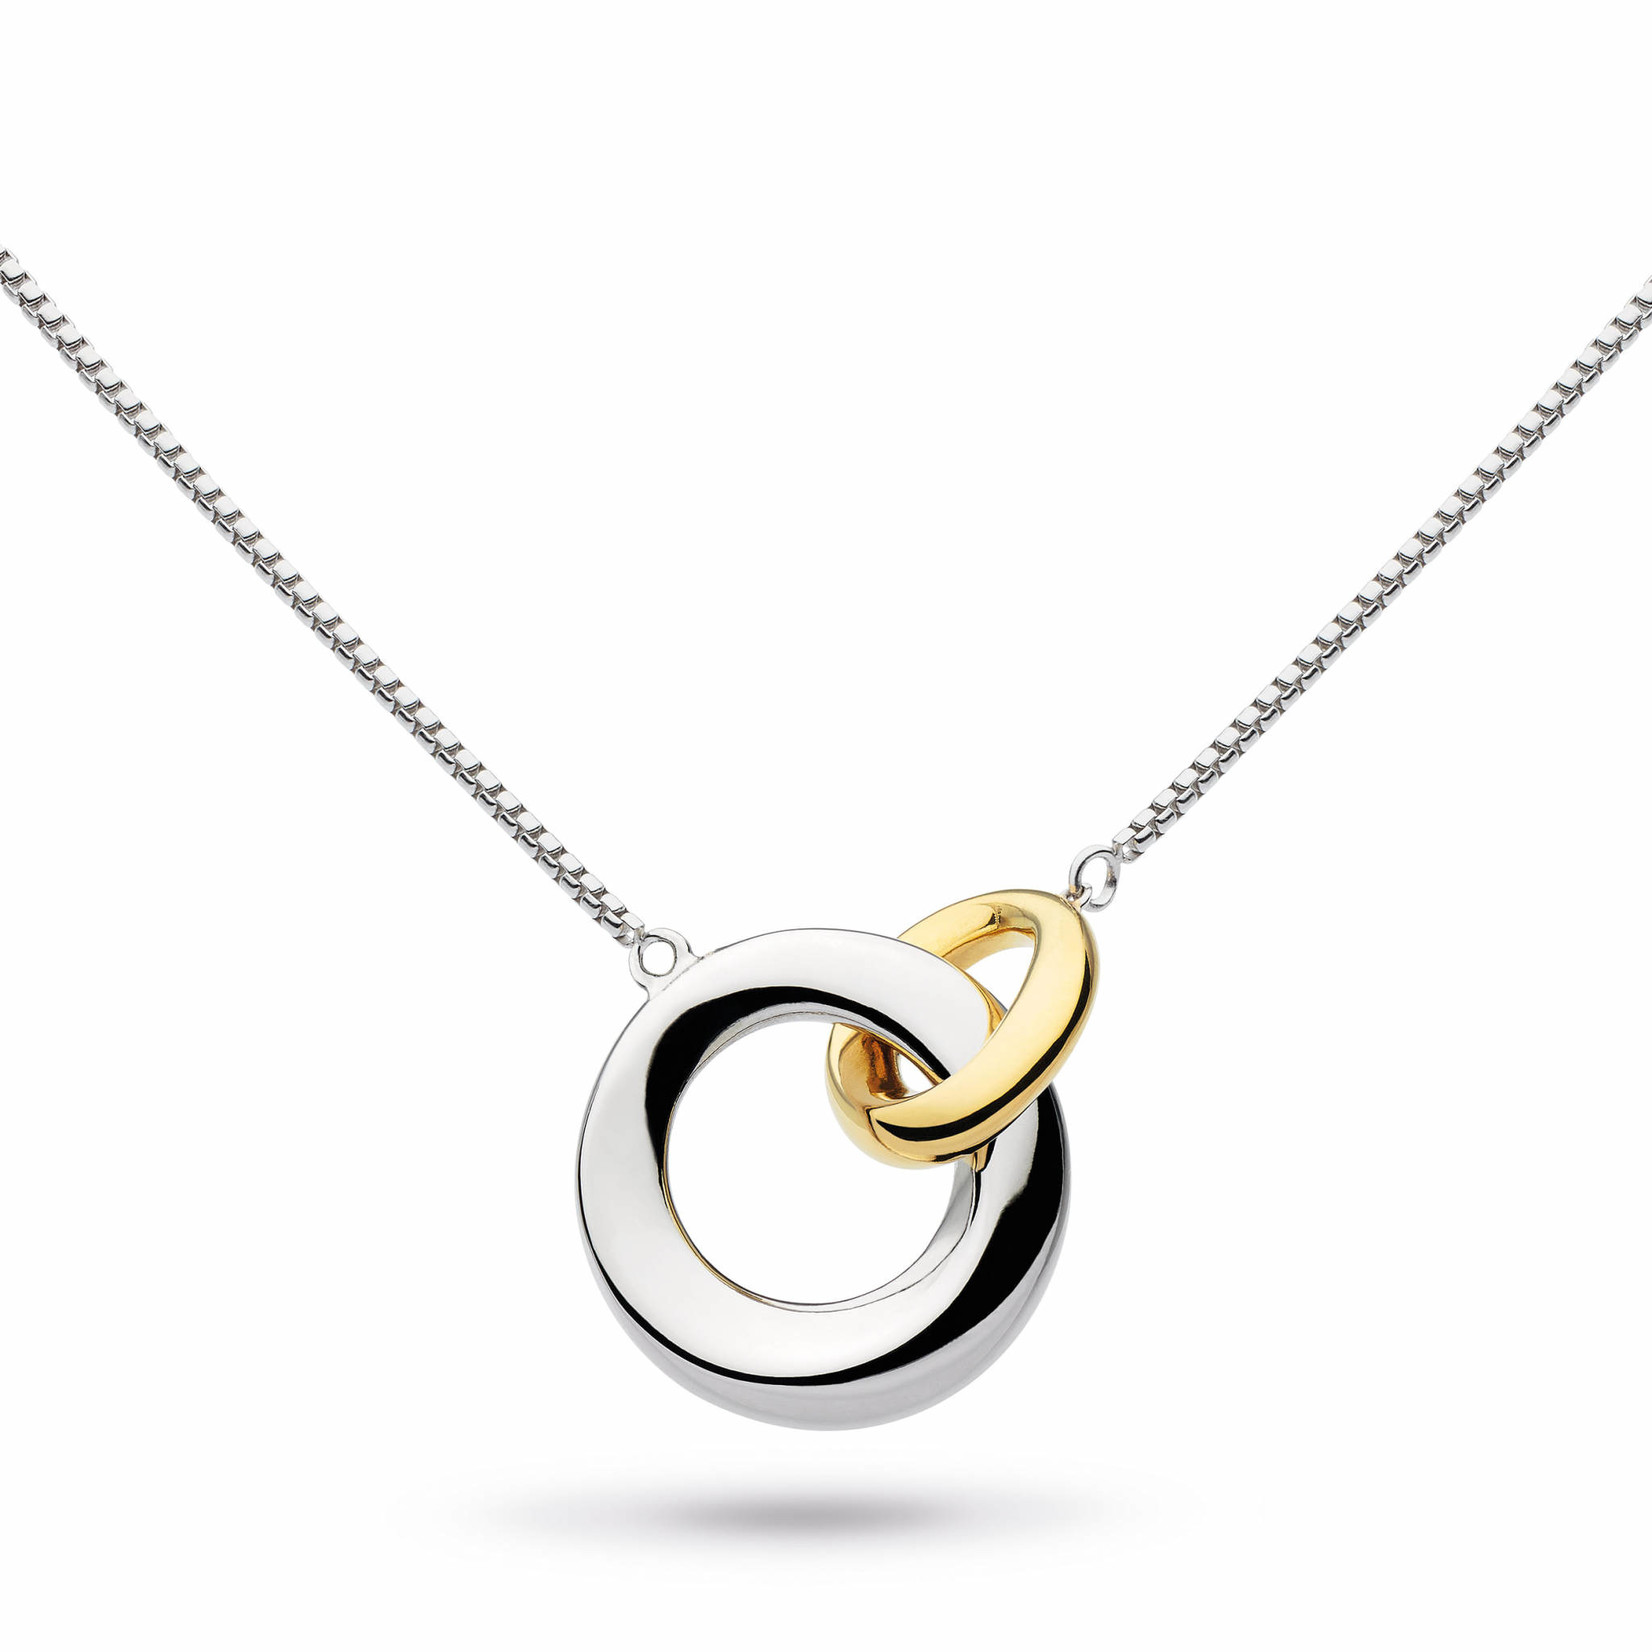 Bevel Cirque Link Gold Plate Necklace